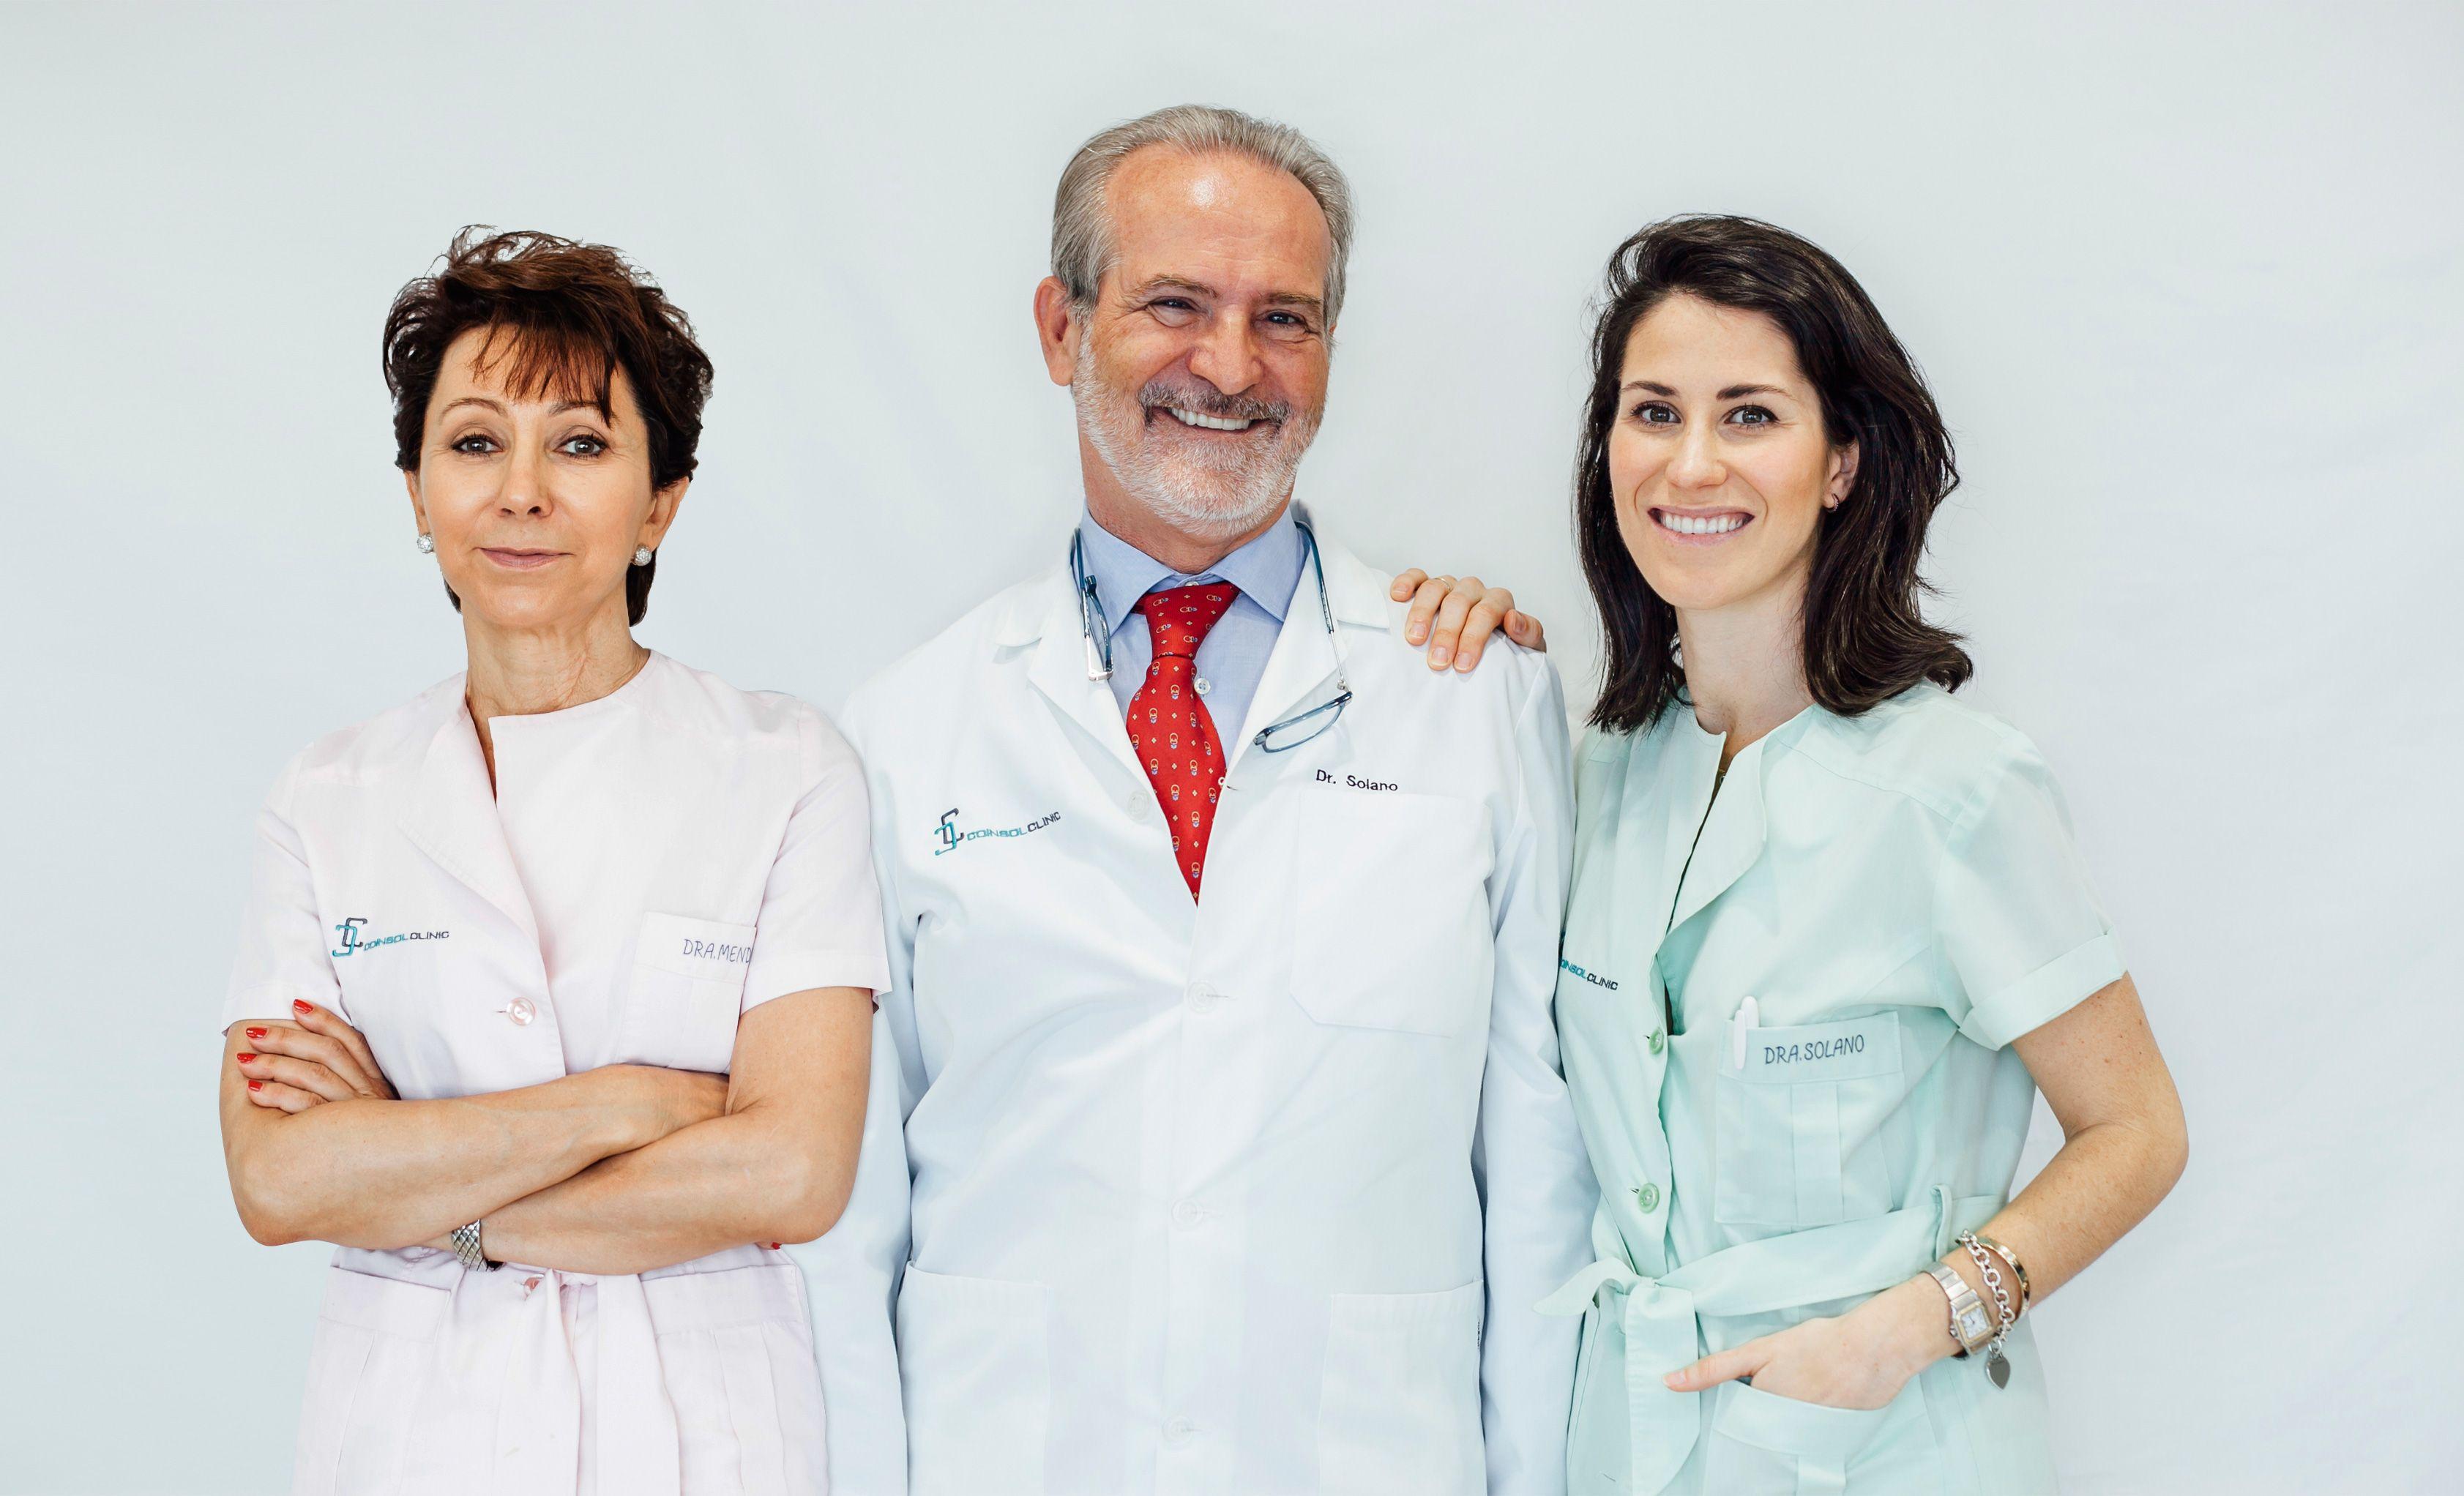 Fotografia Doctores: Asunción Mendoza Mendoza, Enrique Solano Reina